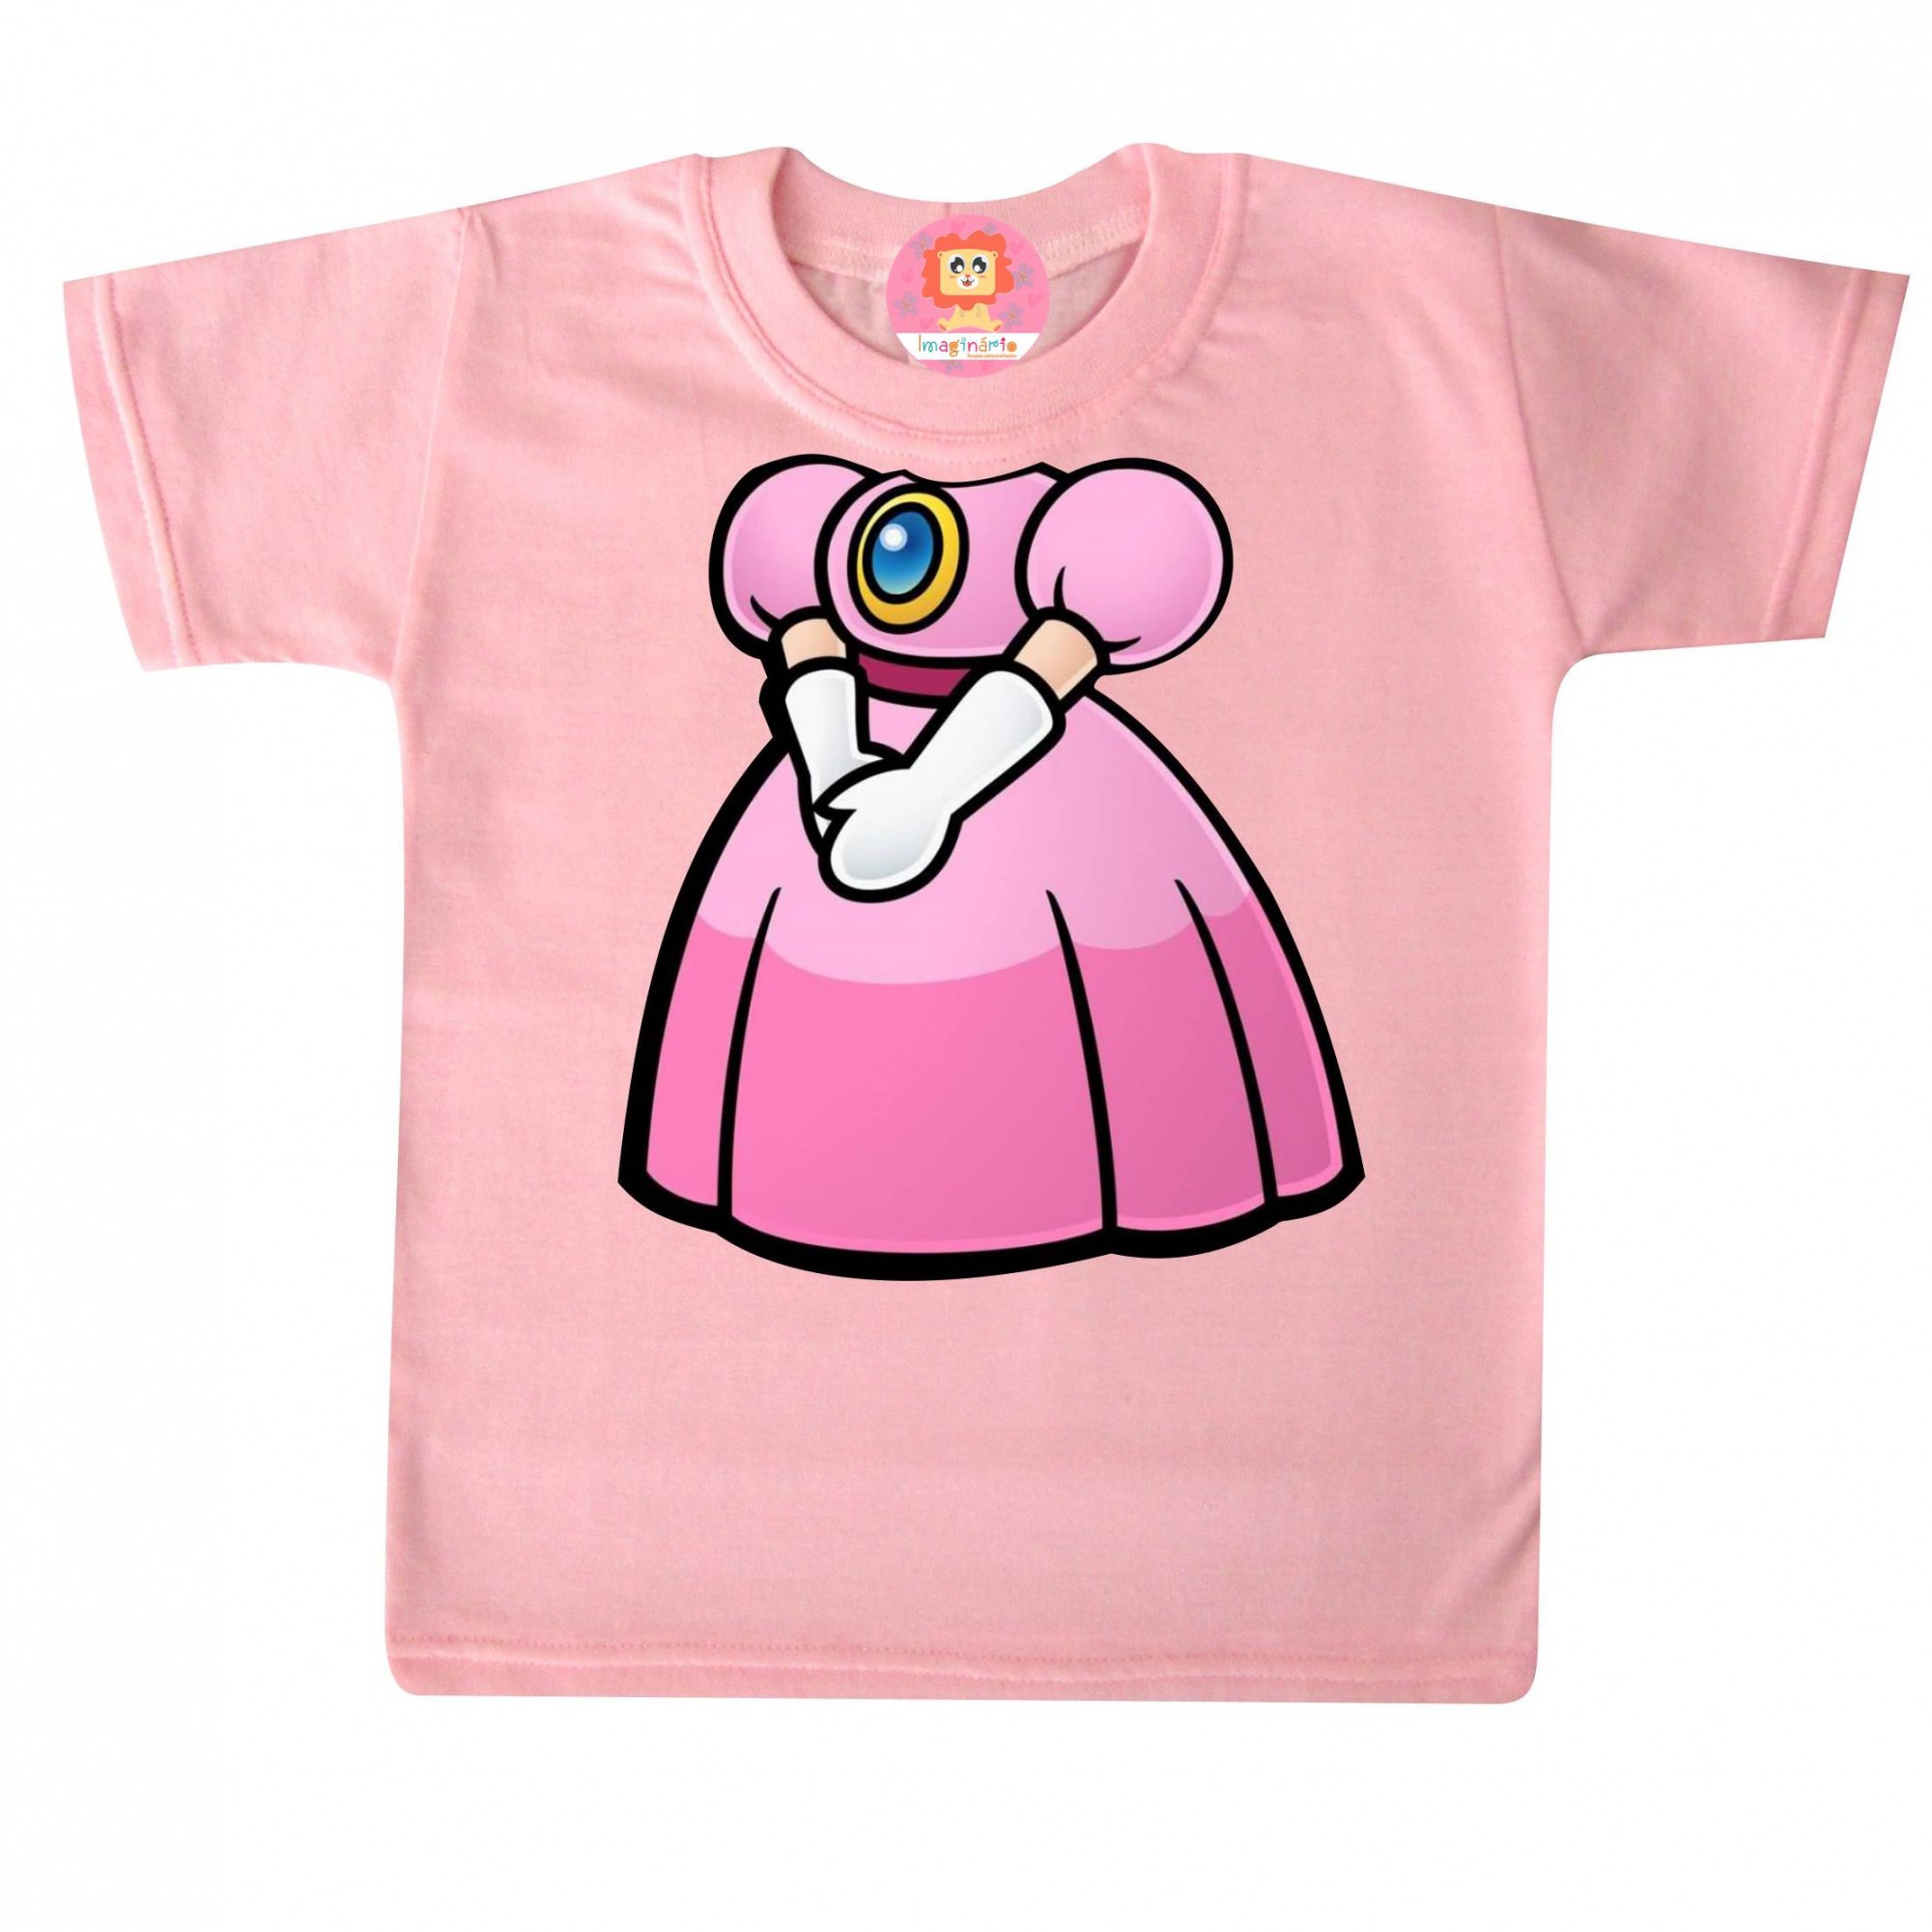 Camiseta ou Body Princesinha do Mario